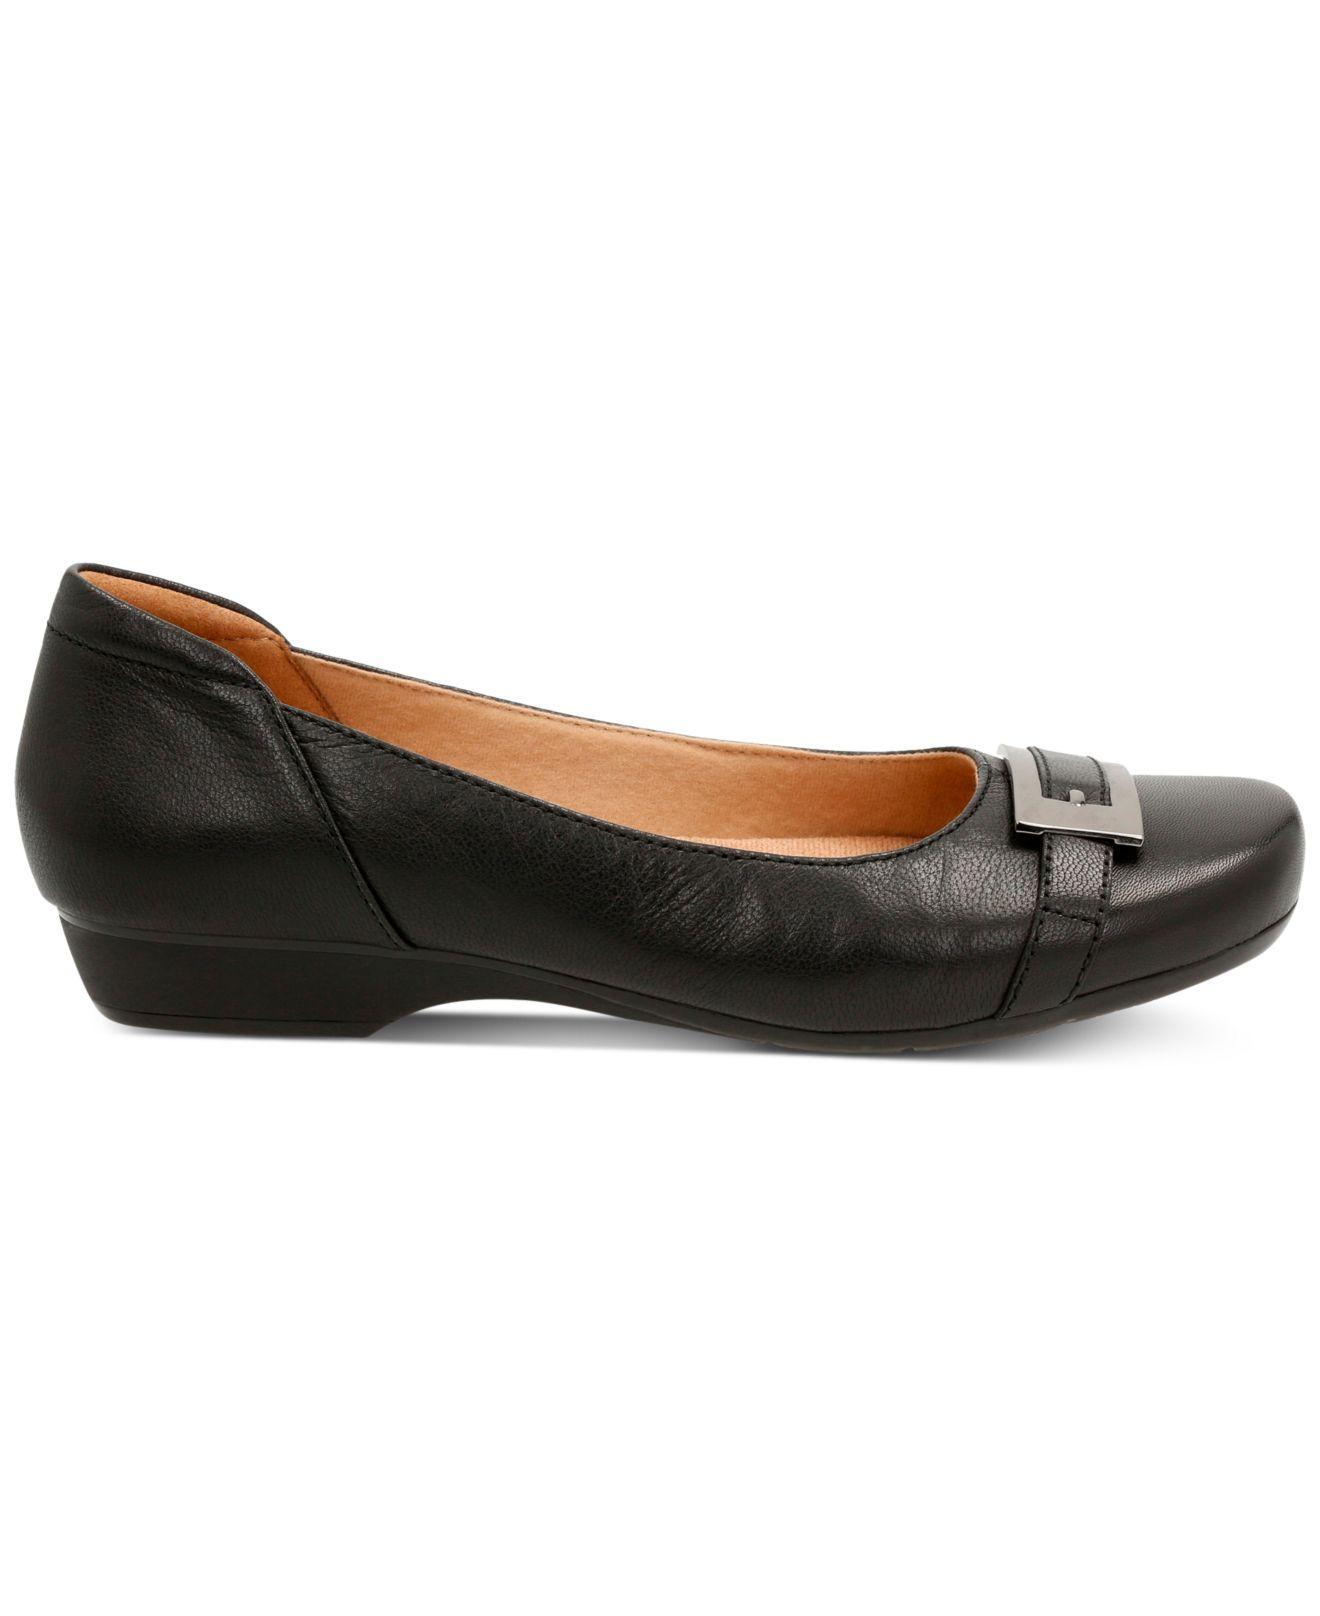 Macys  West Shoes Black Flats